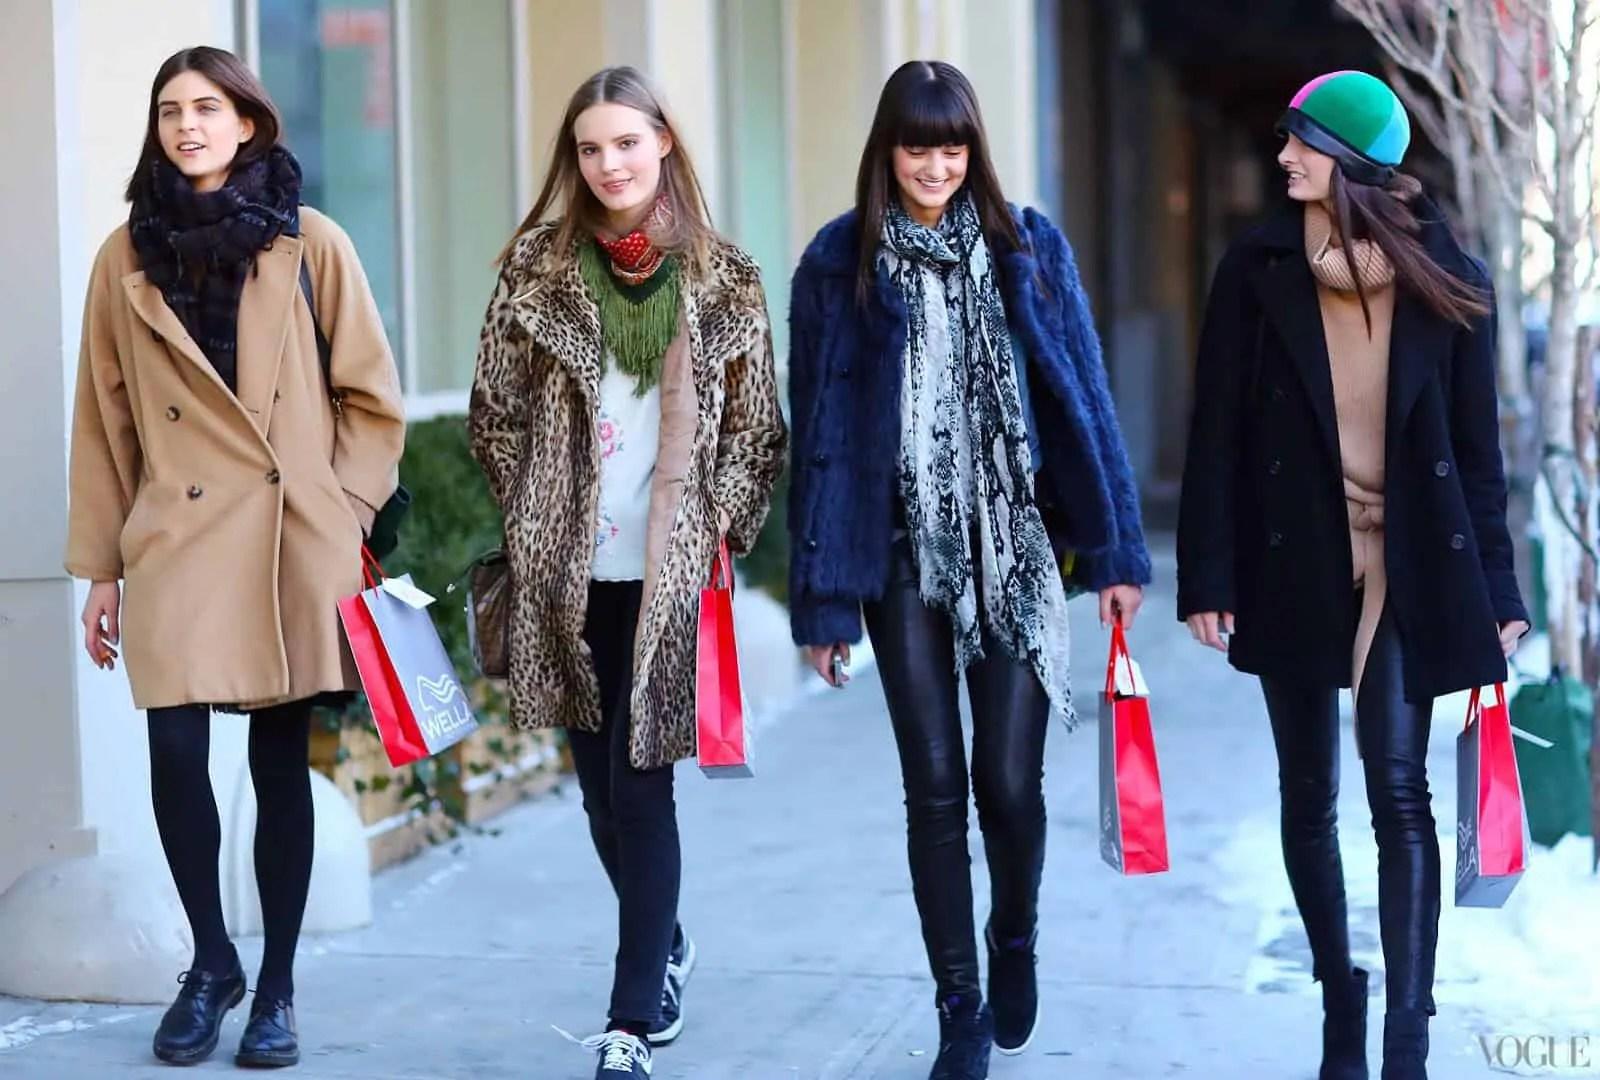 street-style-fashion-week-fall-2013-6 5